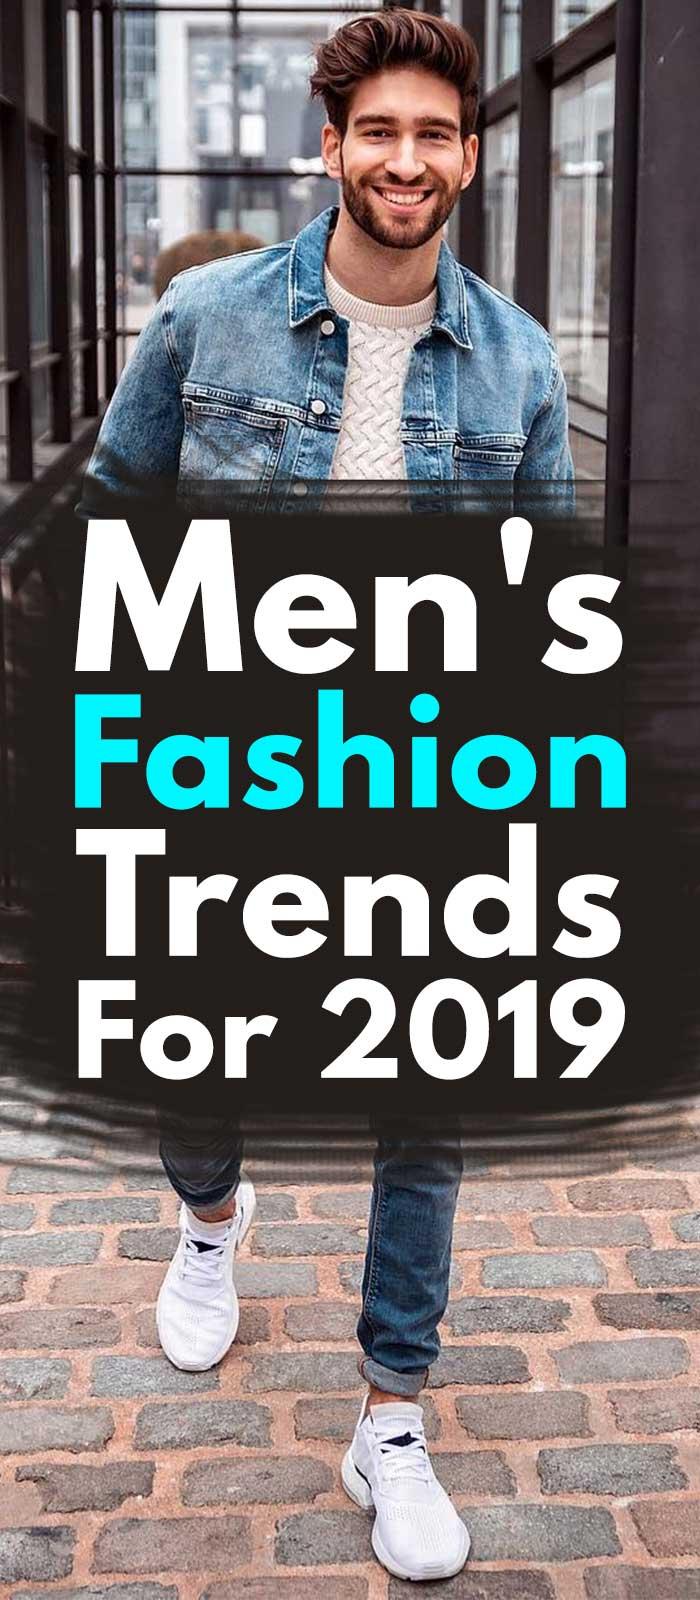 Men's Fashion For 2019